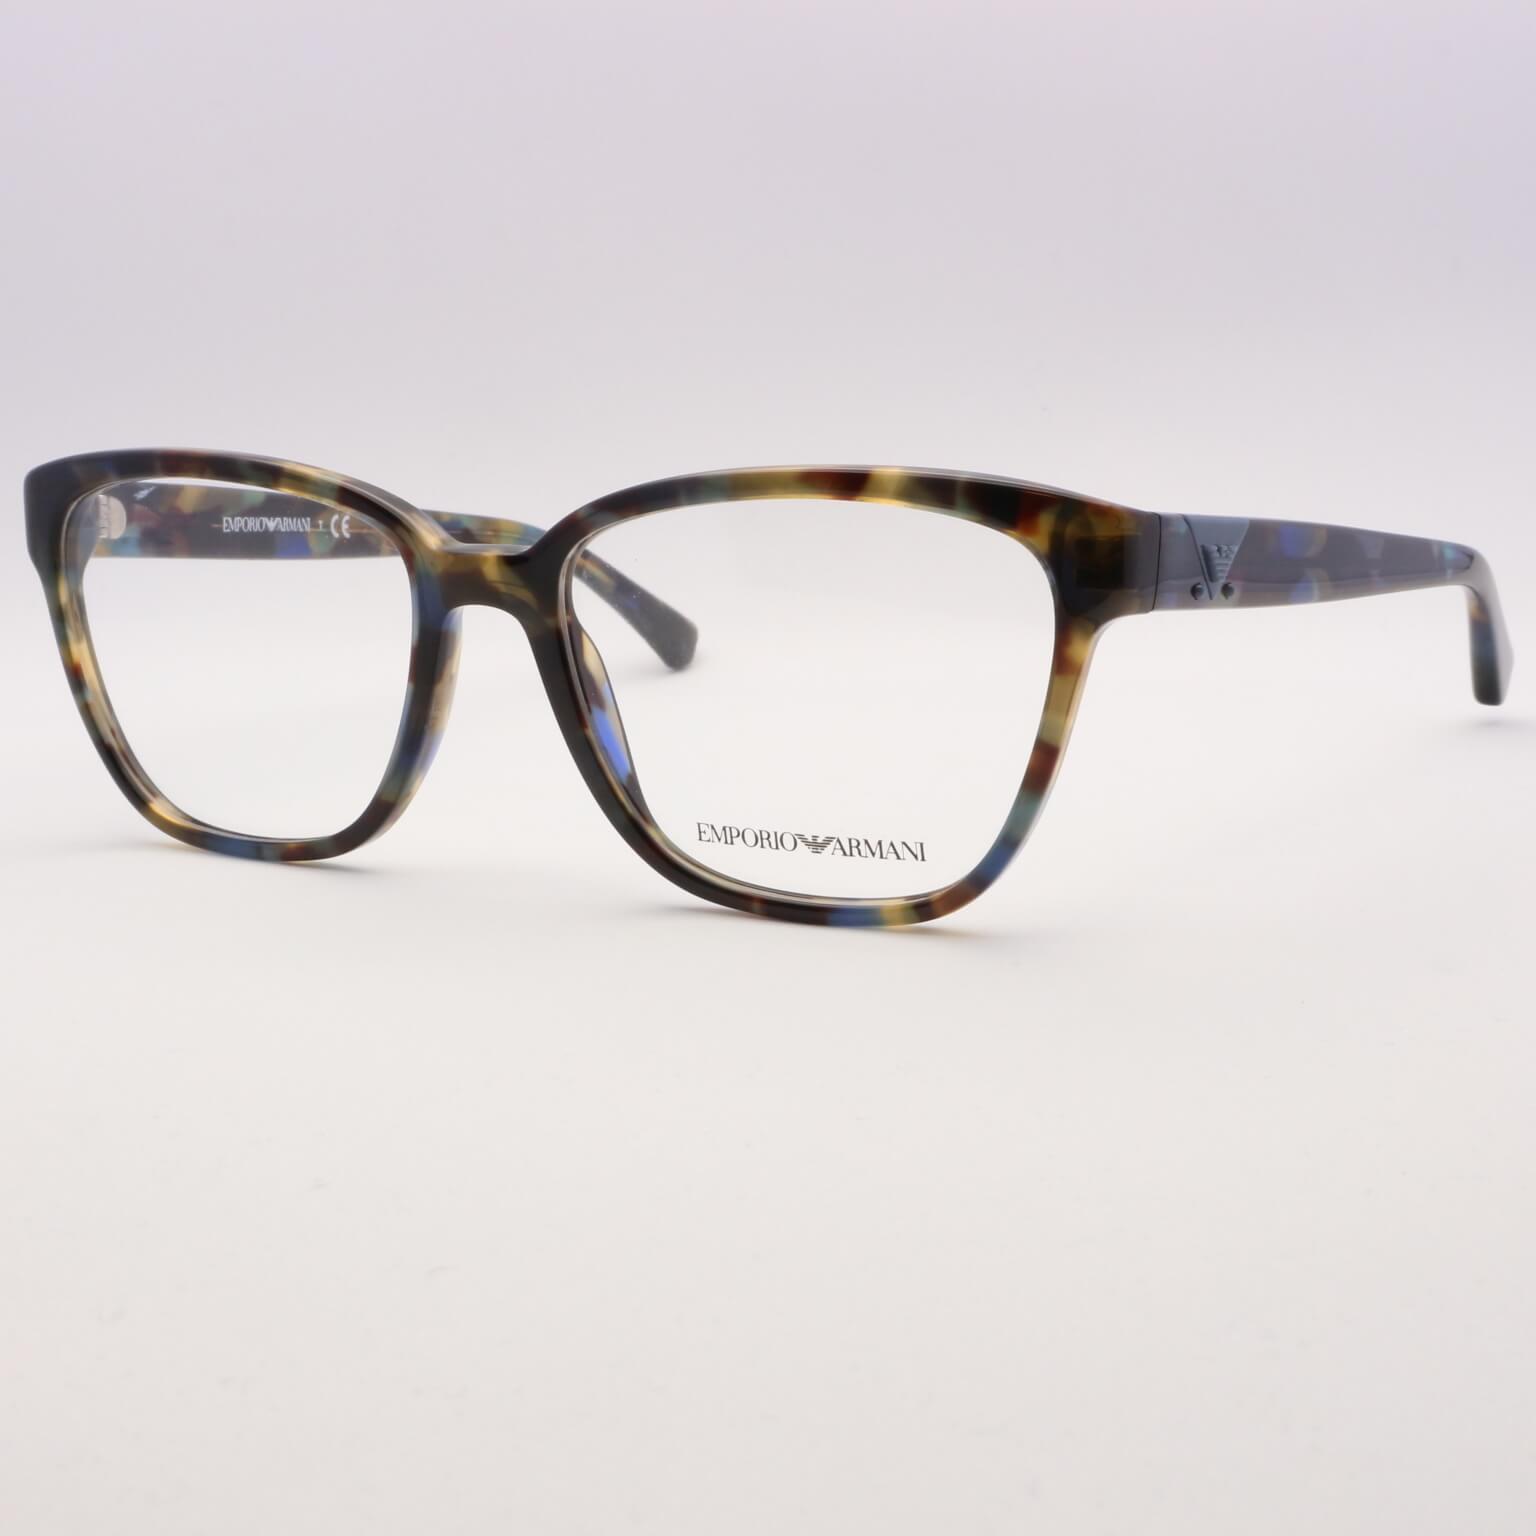 dba52501f0 Γυαλιά οράσεως Emporio Armani 3059 5394 ~ Οπτικά Eyelab